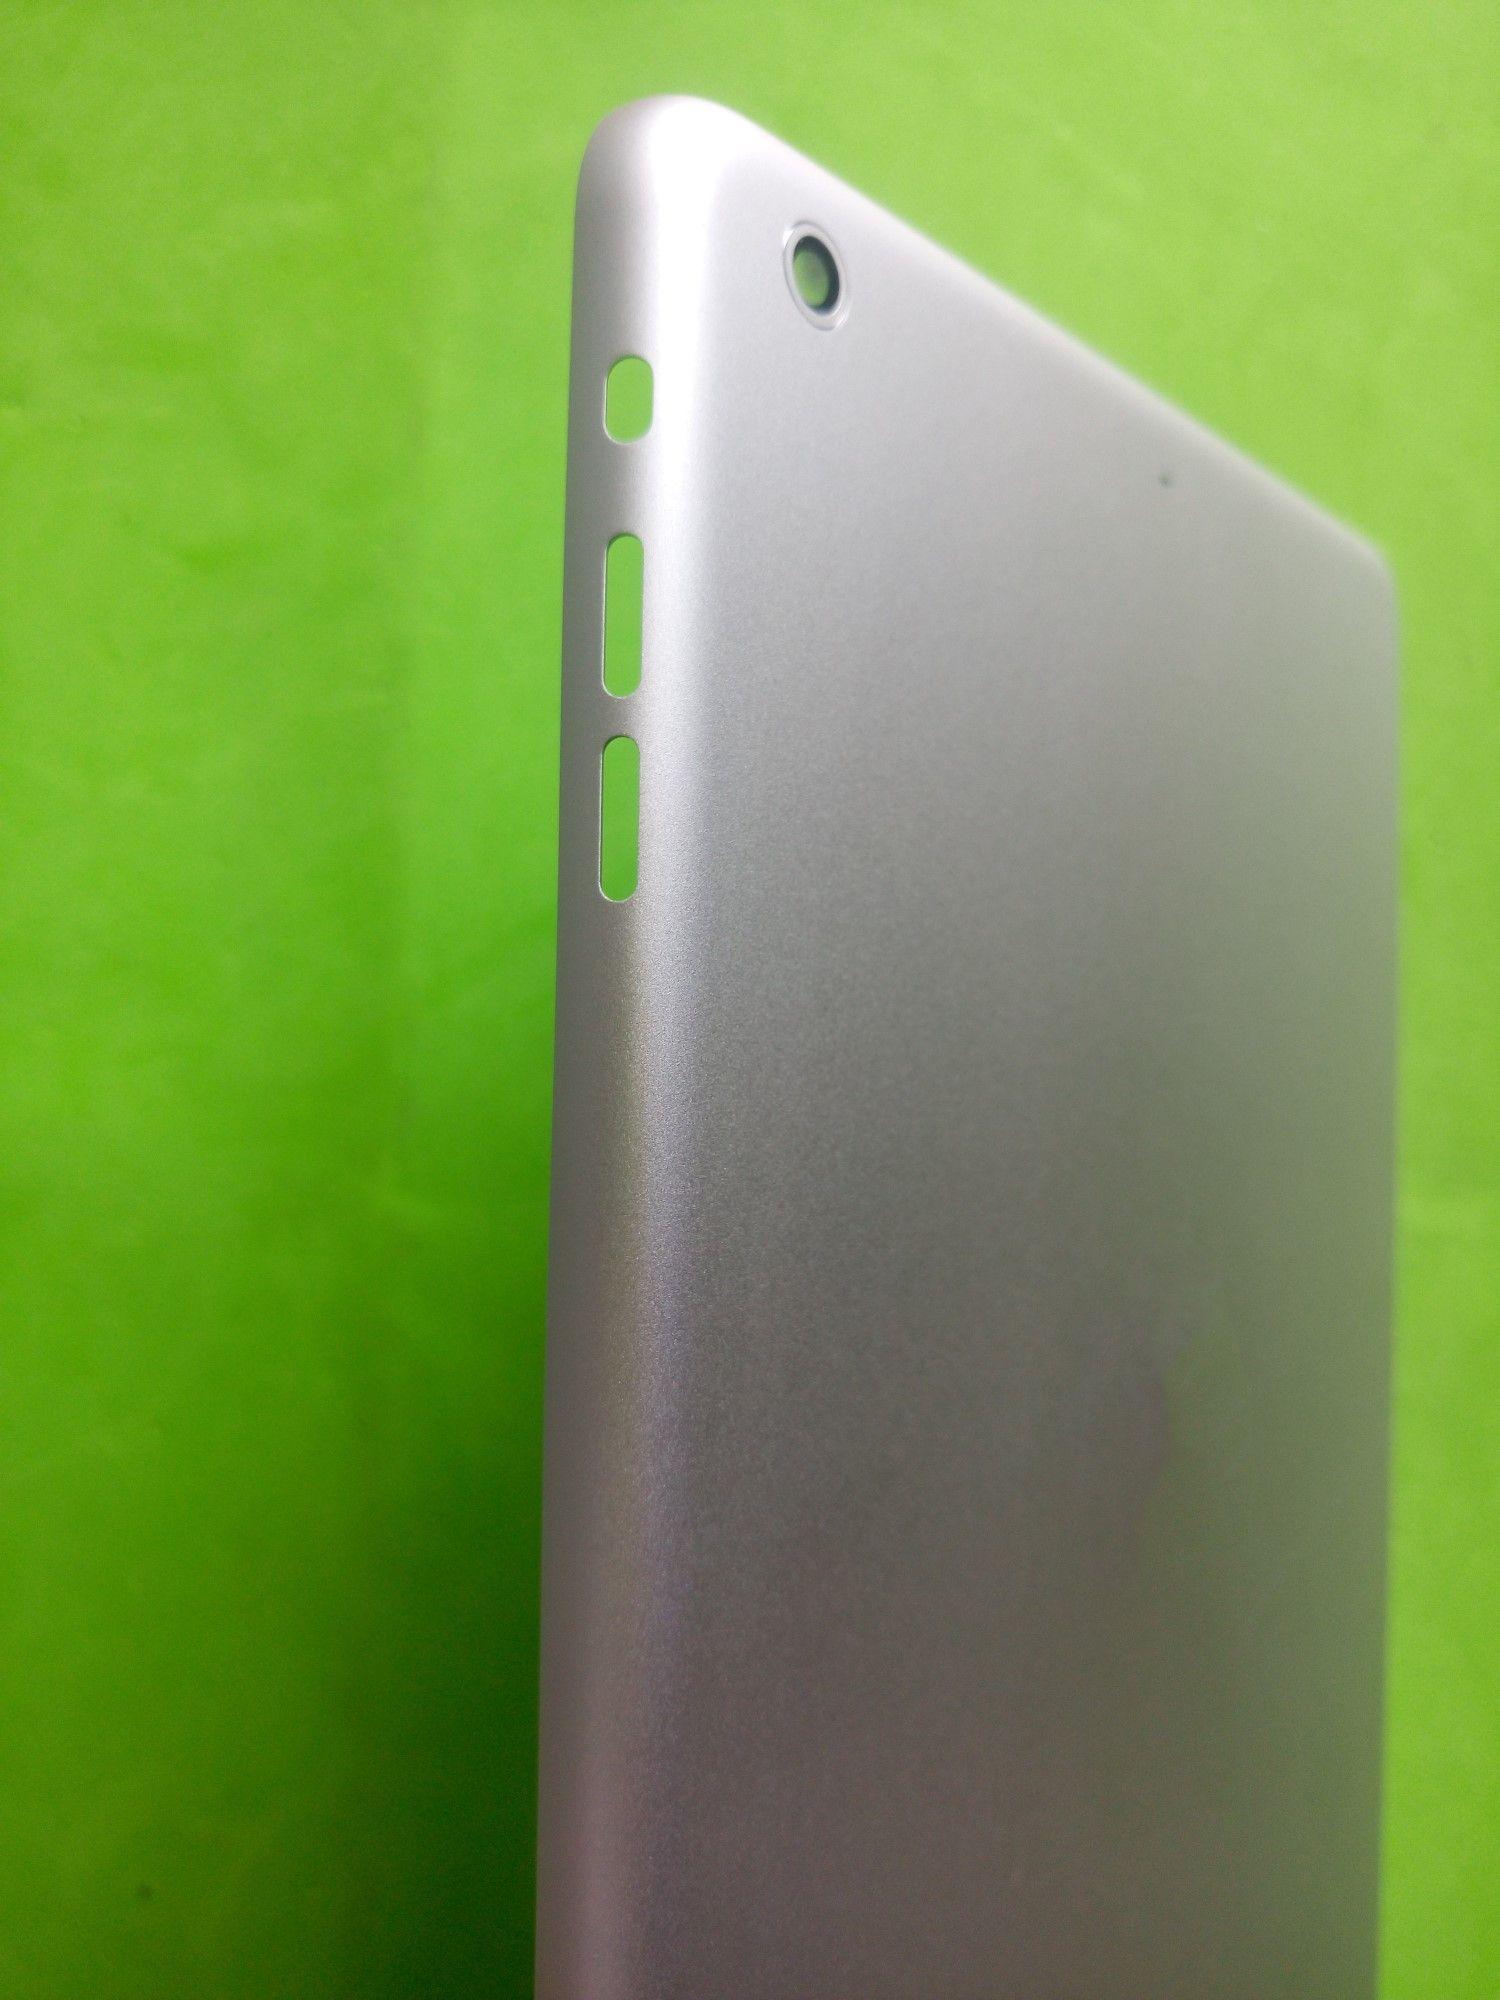 1PCS Rear Back Cover Battery Housing Door Frame Bezel Case For ipad mini 2 A1489 Mini2 WIFI Version A1490 3G